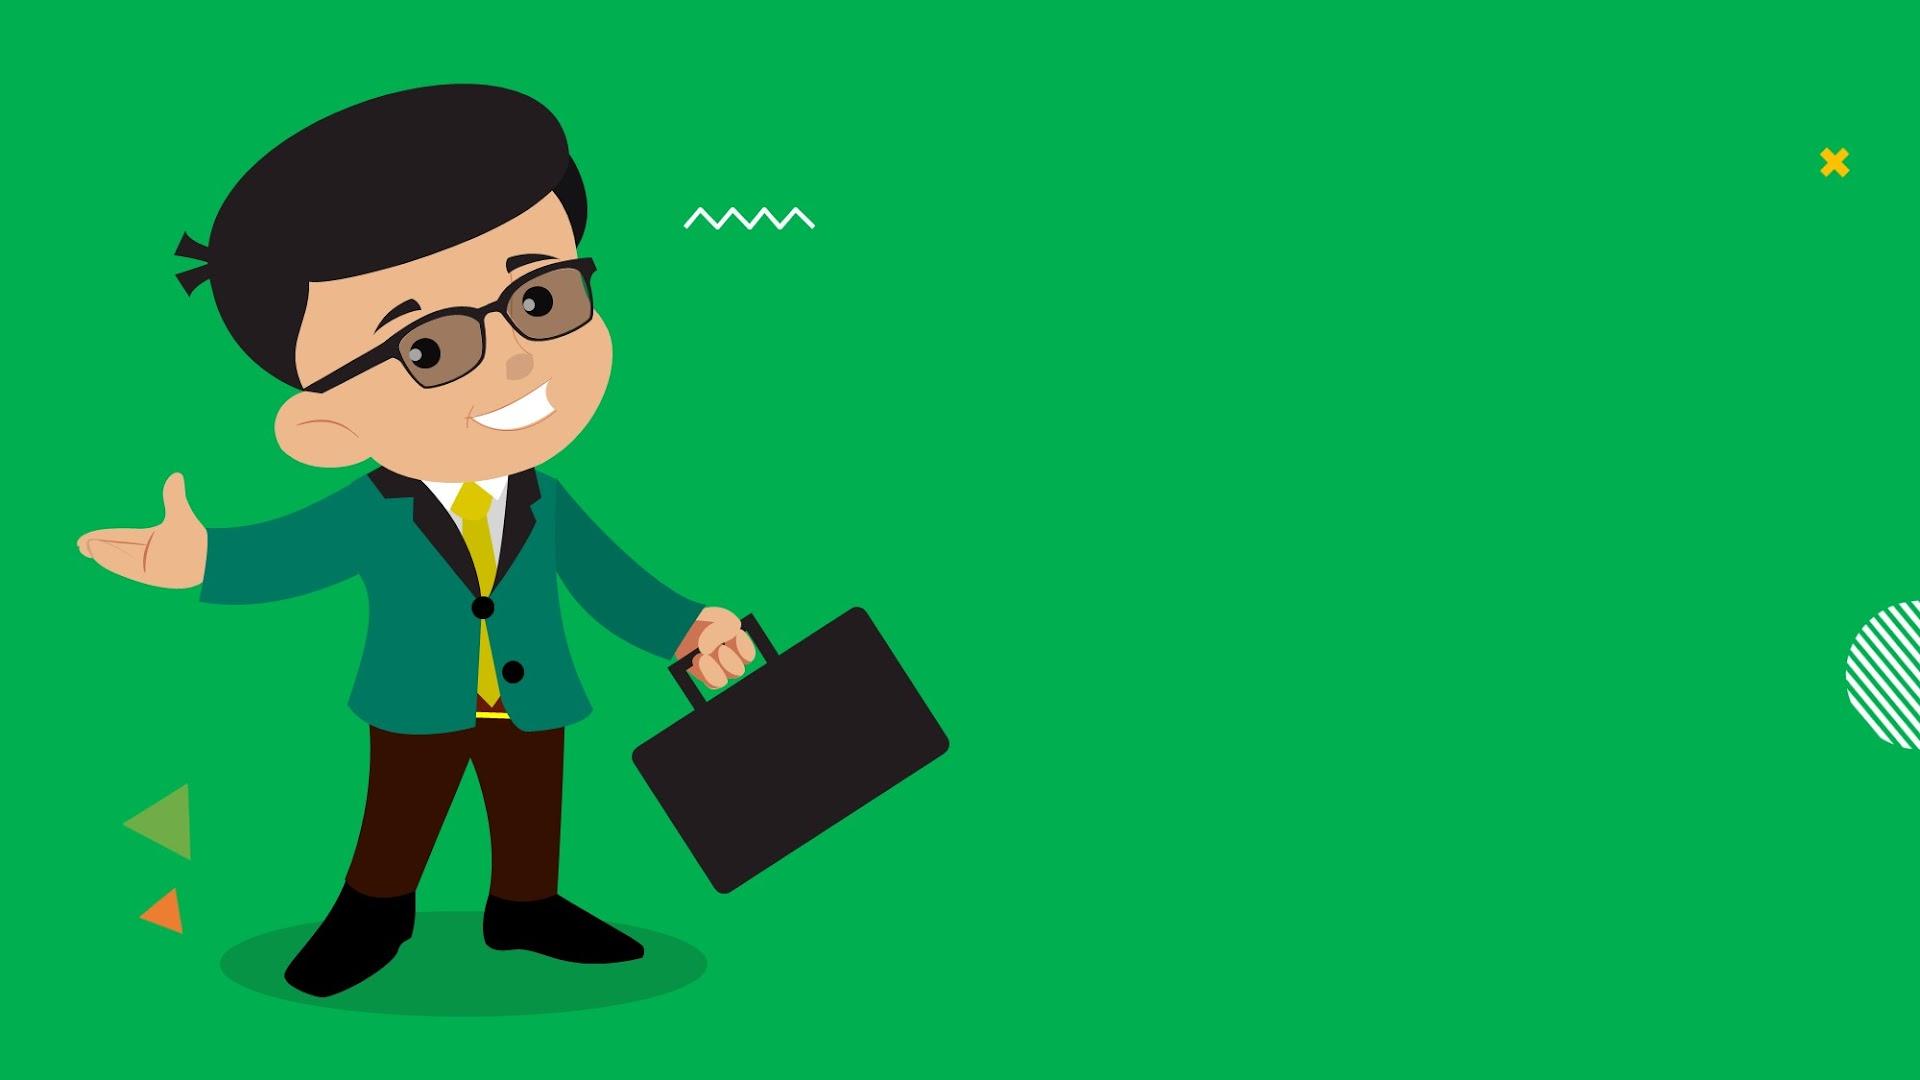 Cartoon Salesman - free background for Presentations